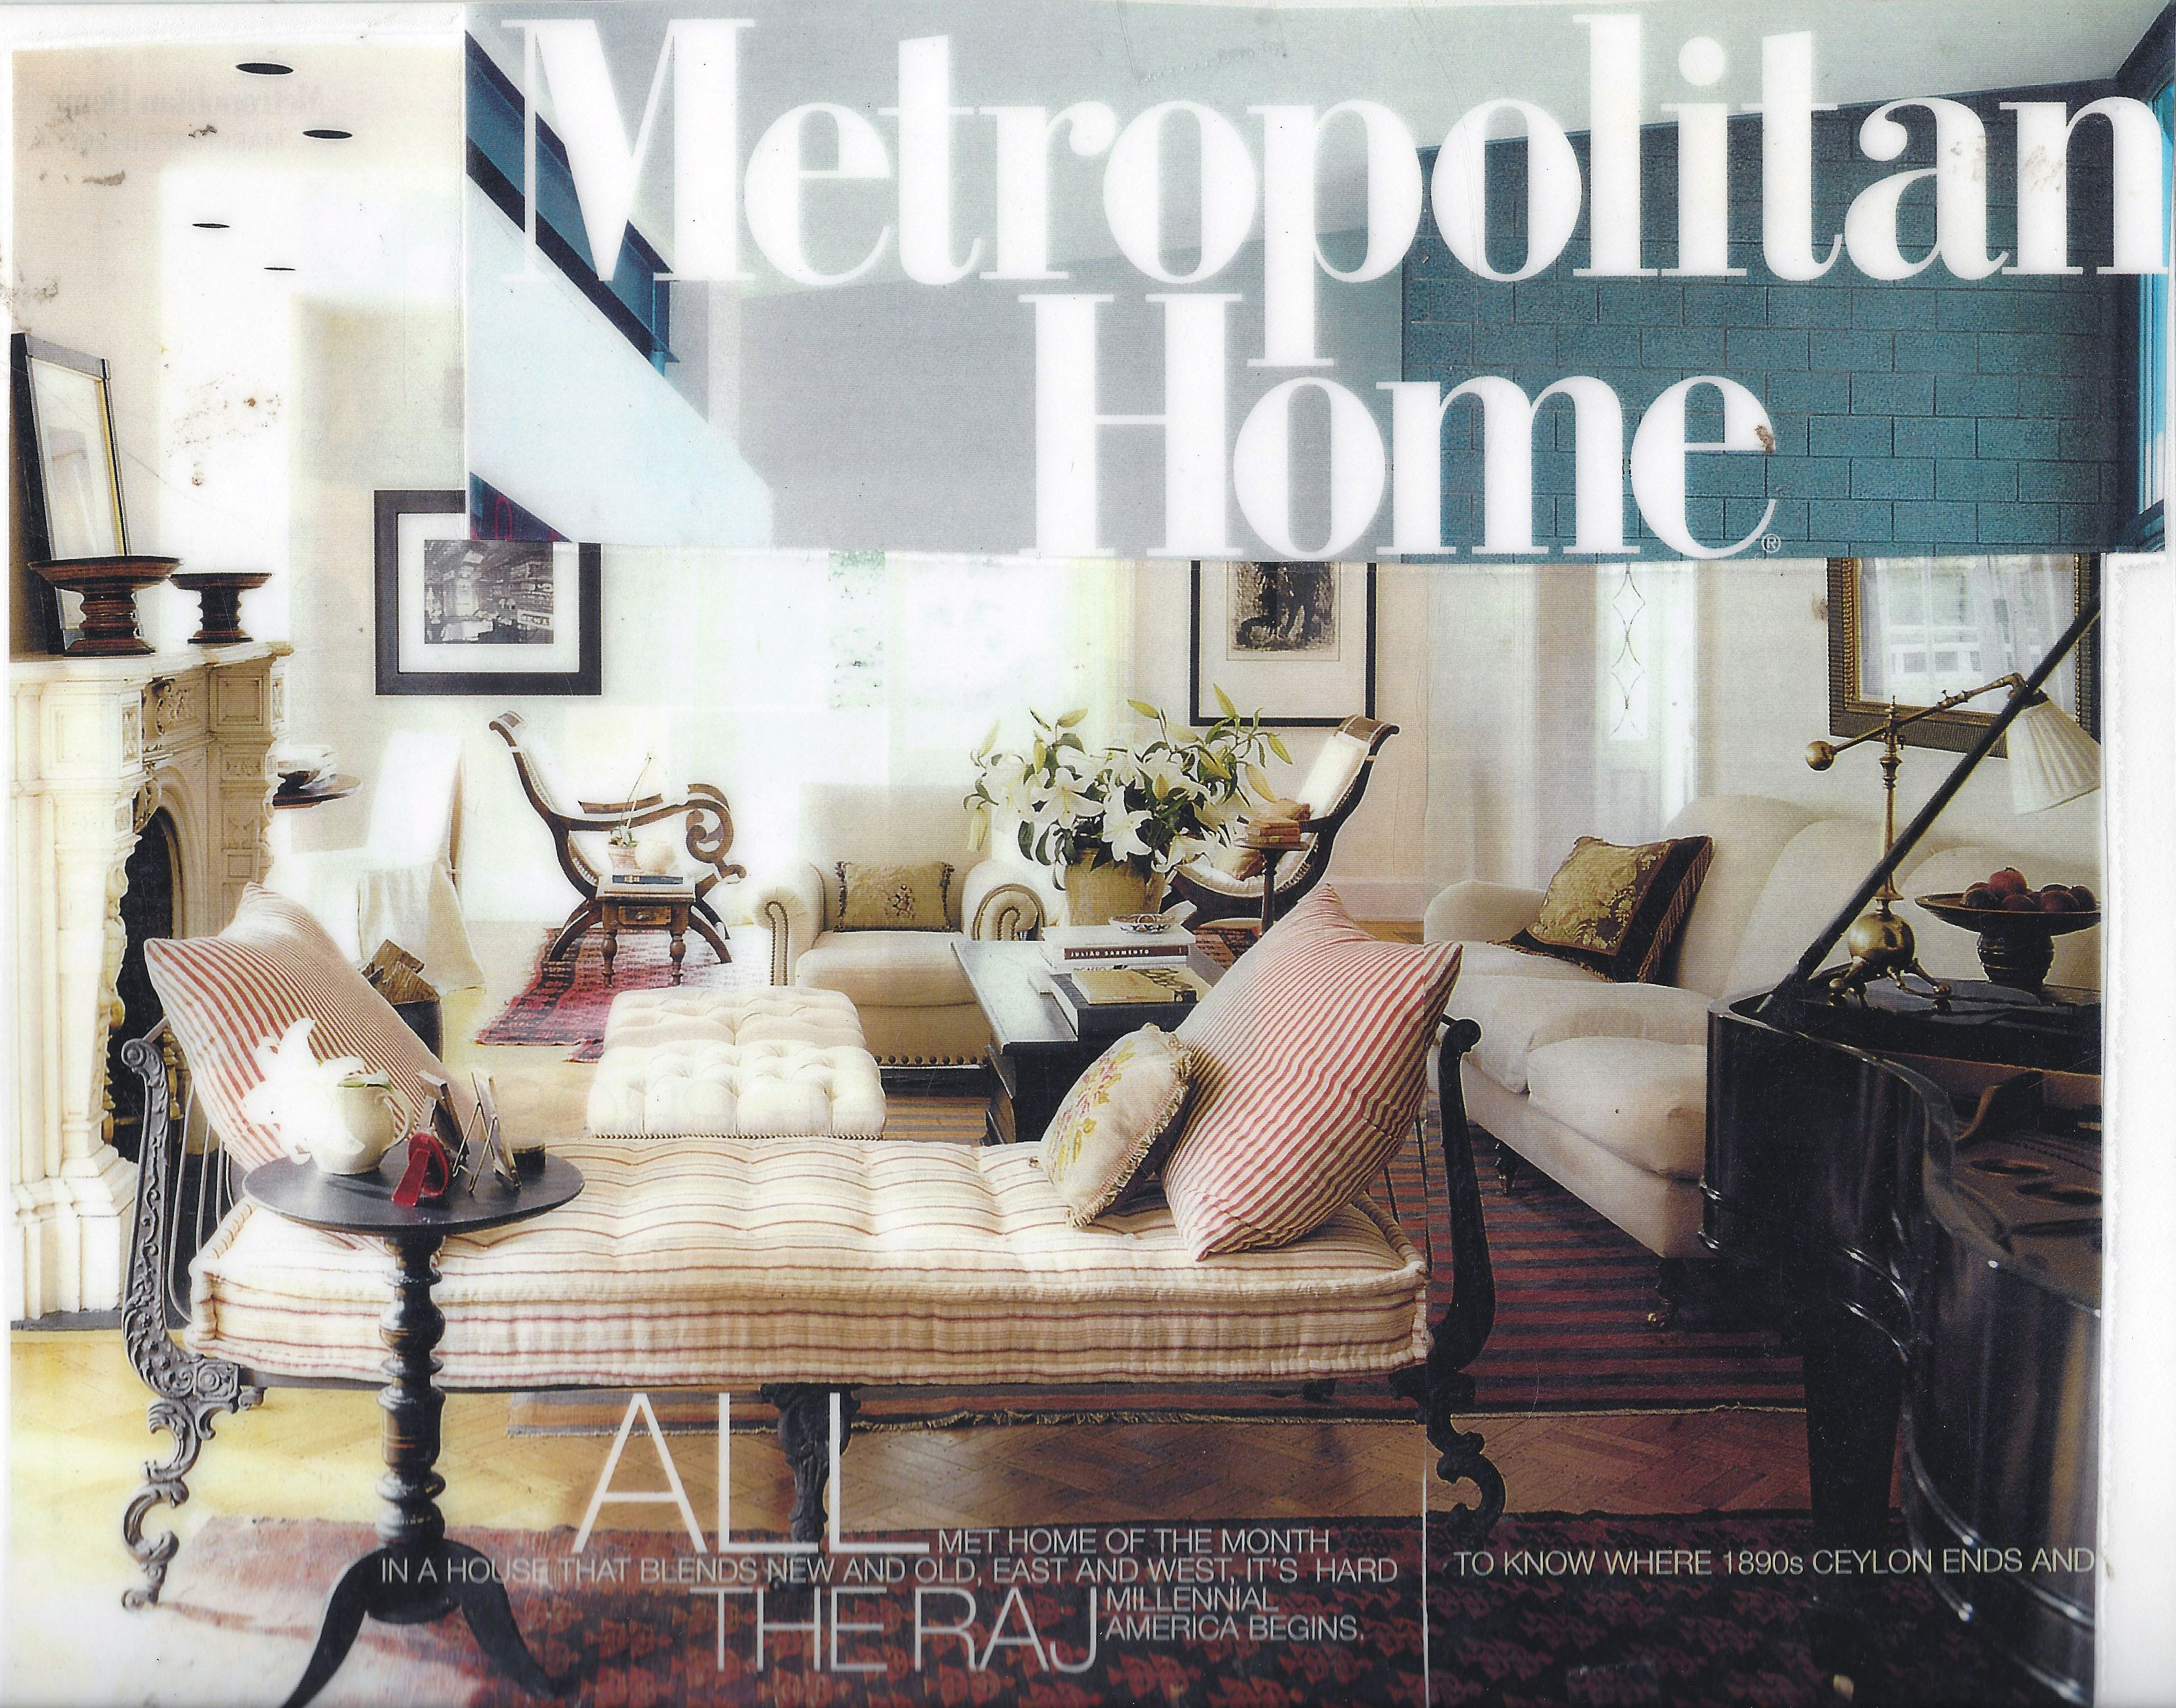 Metropolitan Home. Anglo Raj Antiques.